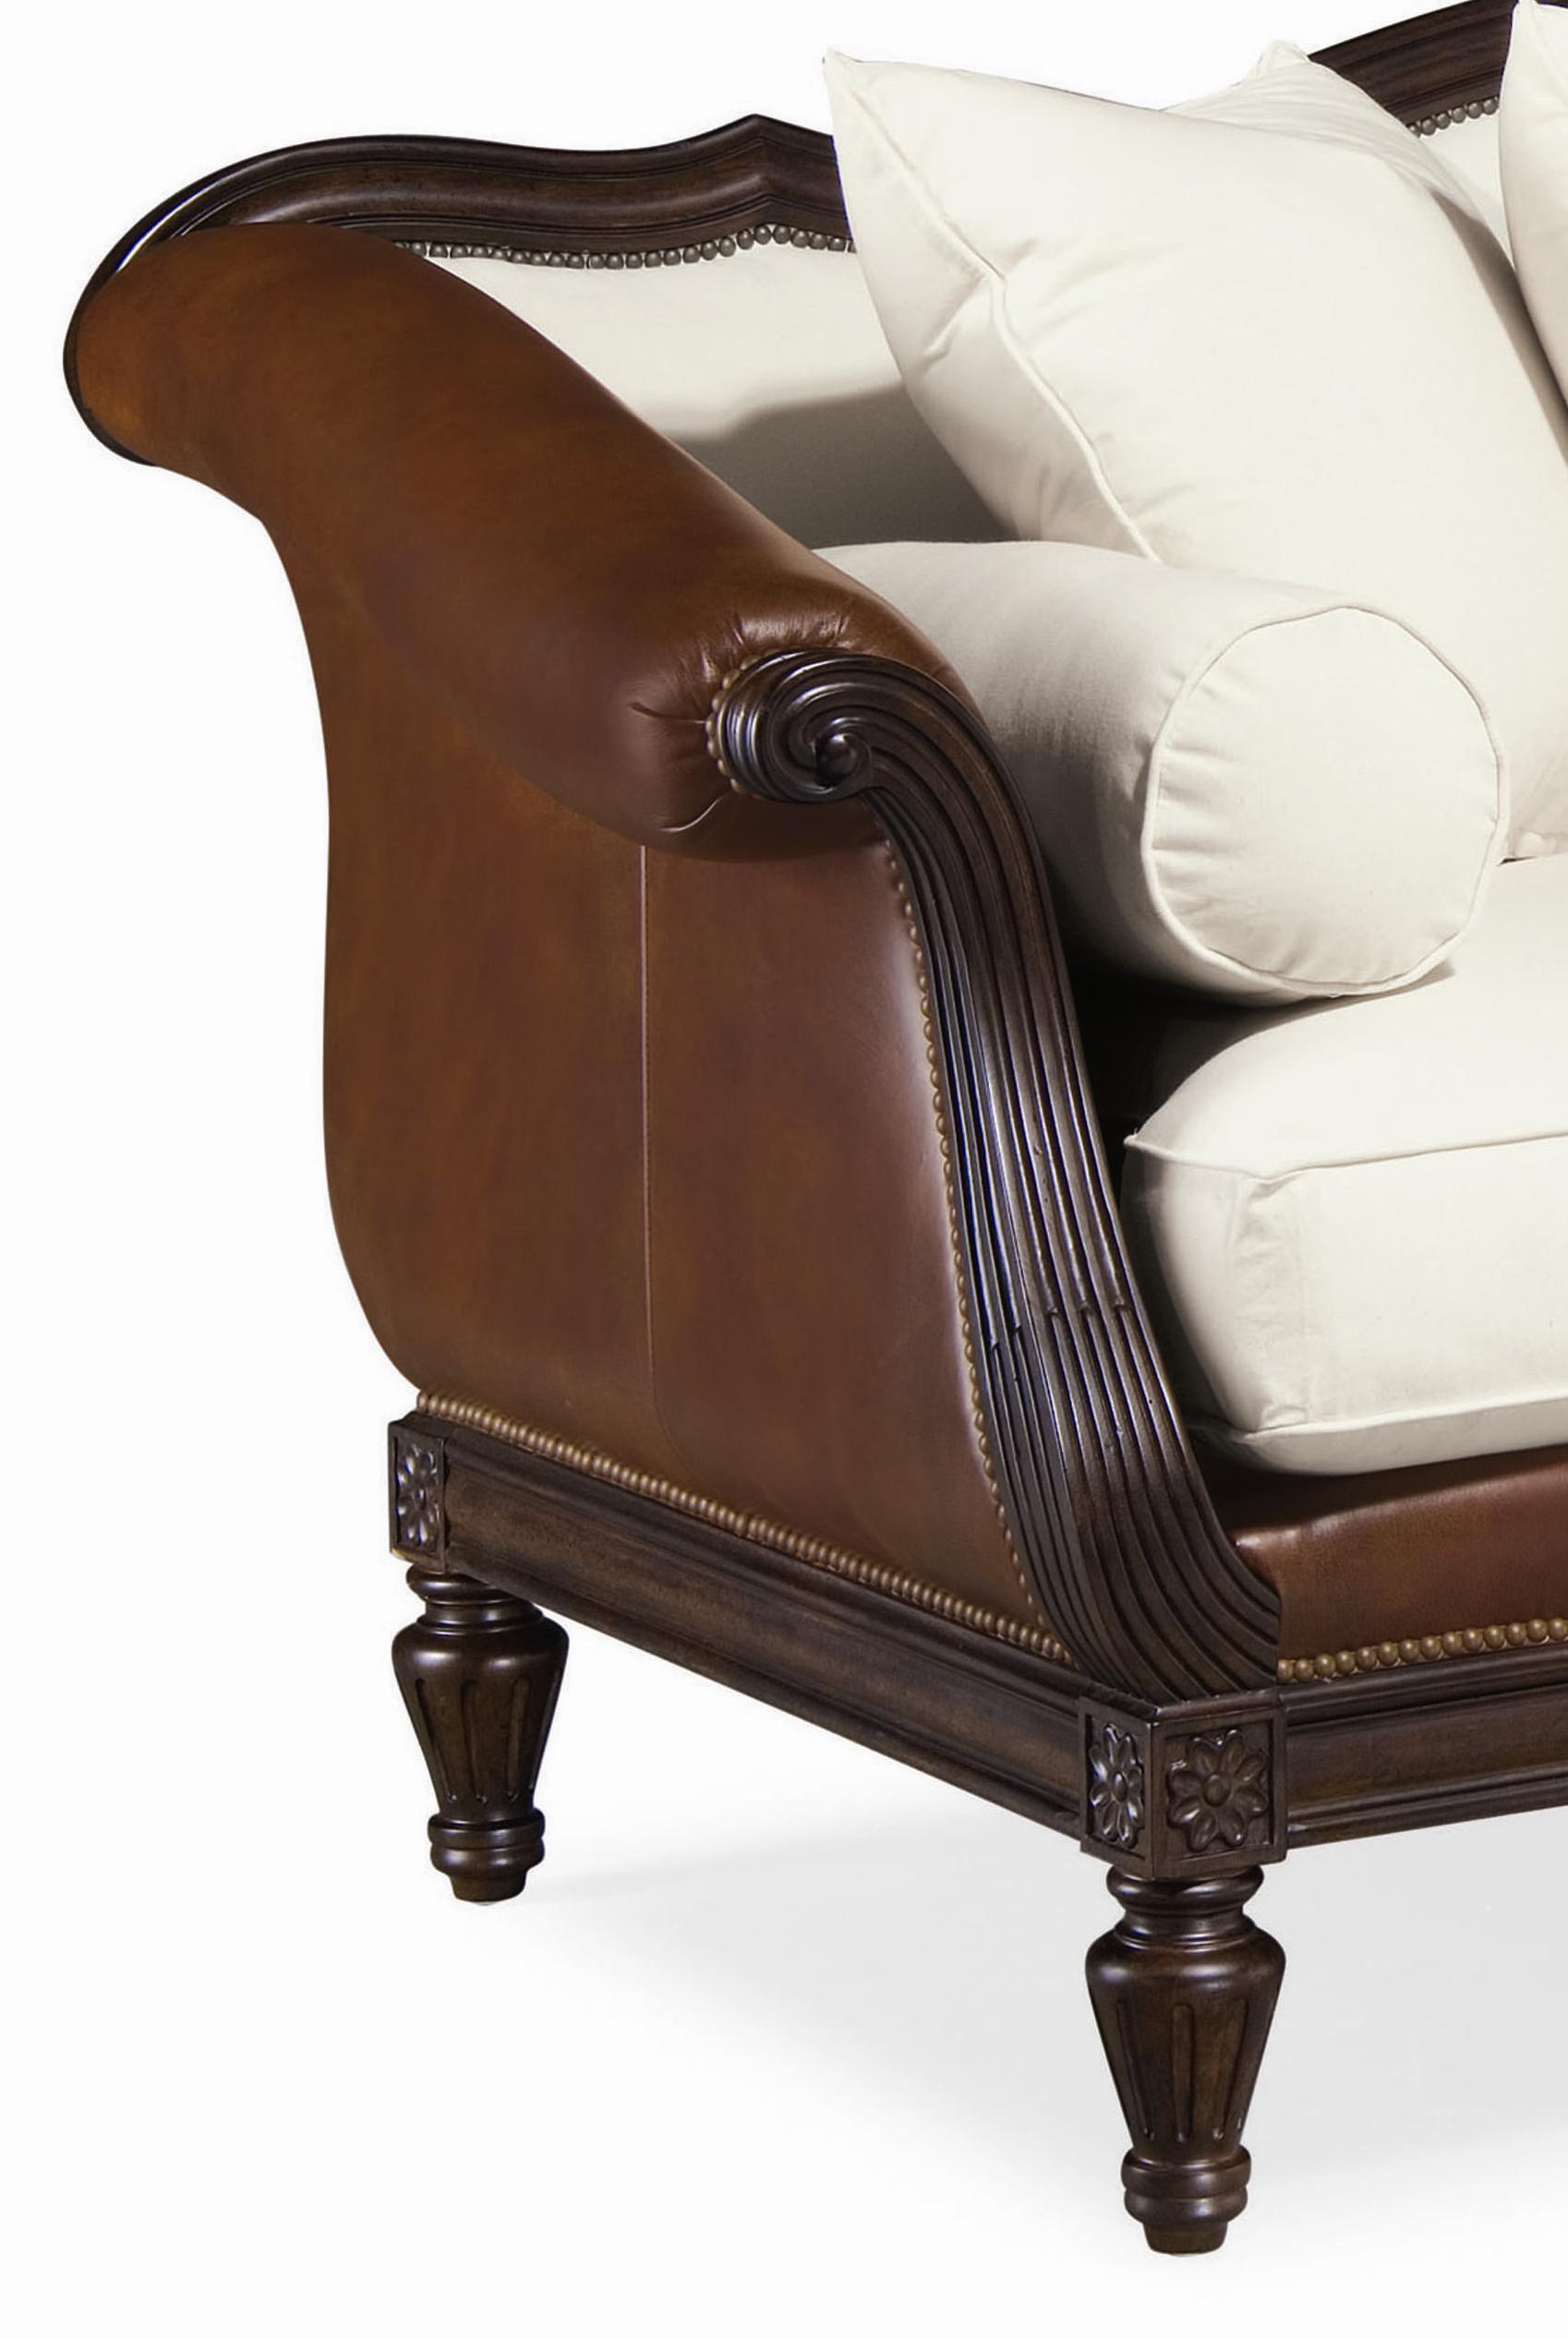 Ordinaire Thomasville® Sorrento Classic Single Seat Sofa With Shaped Back And Wood  Base   BigFurnitureWebsite   Sofa